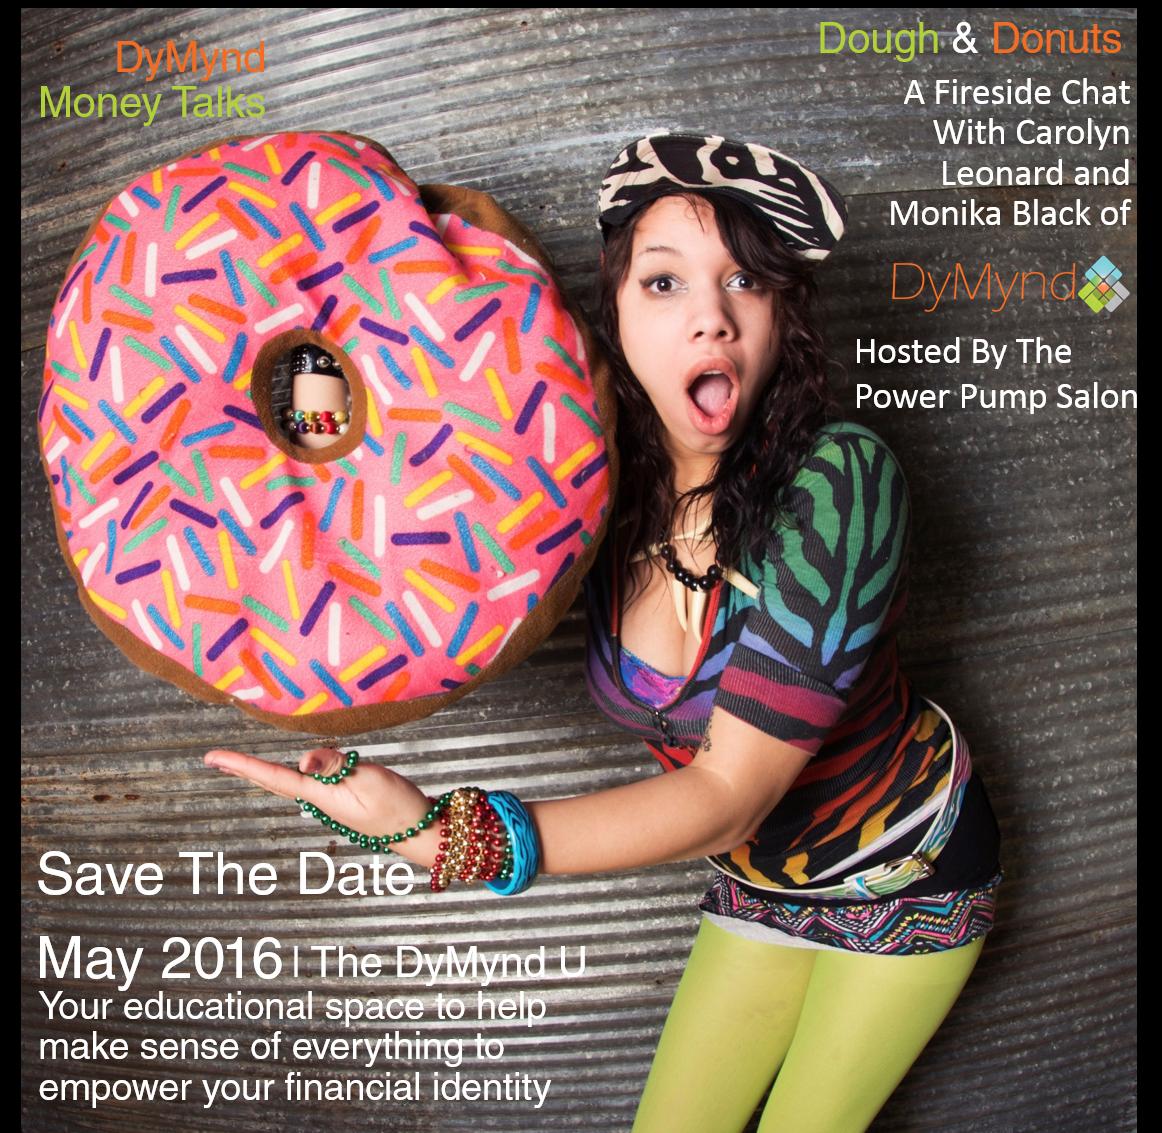 smart money talk | dough & donuts - dymynd